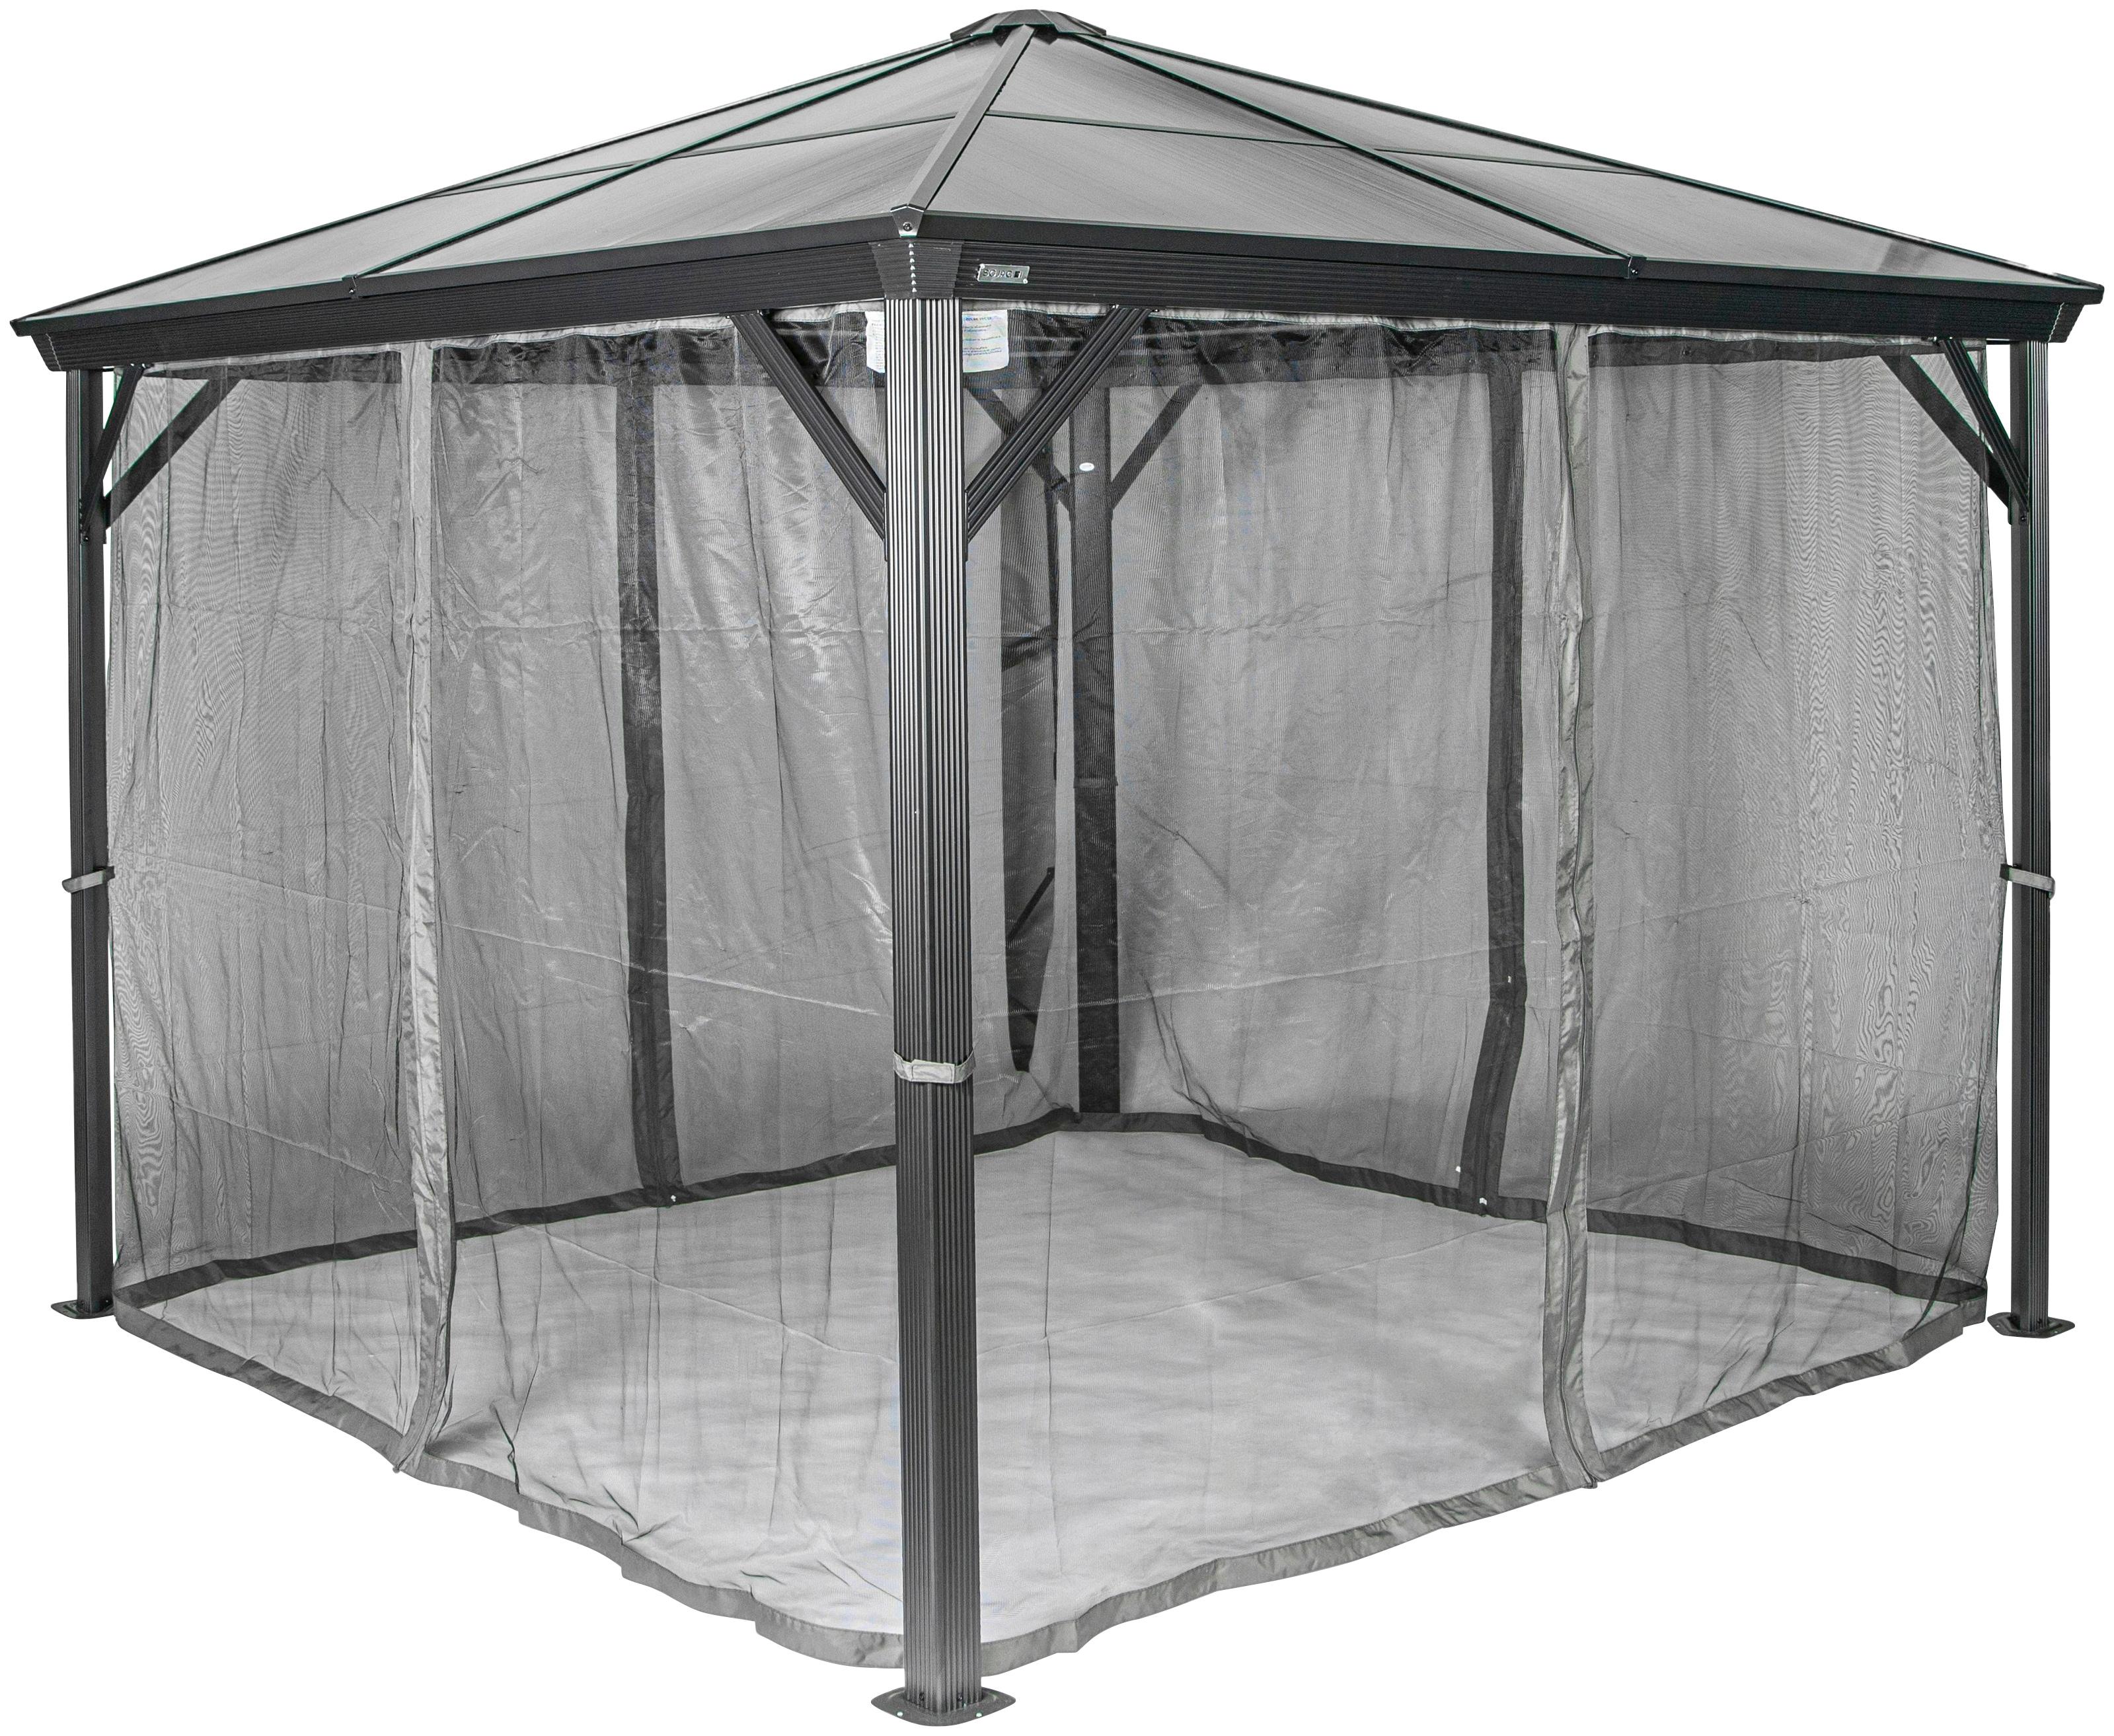 Sojag Pavillon Verona 10x10, BxT: 298x298 cm günstig online kaufen